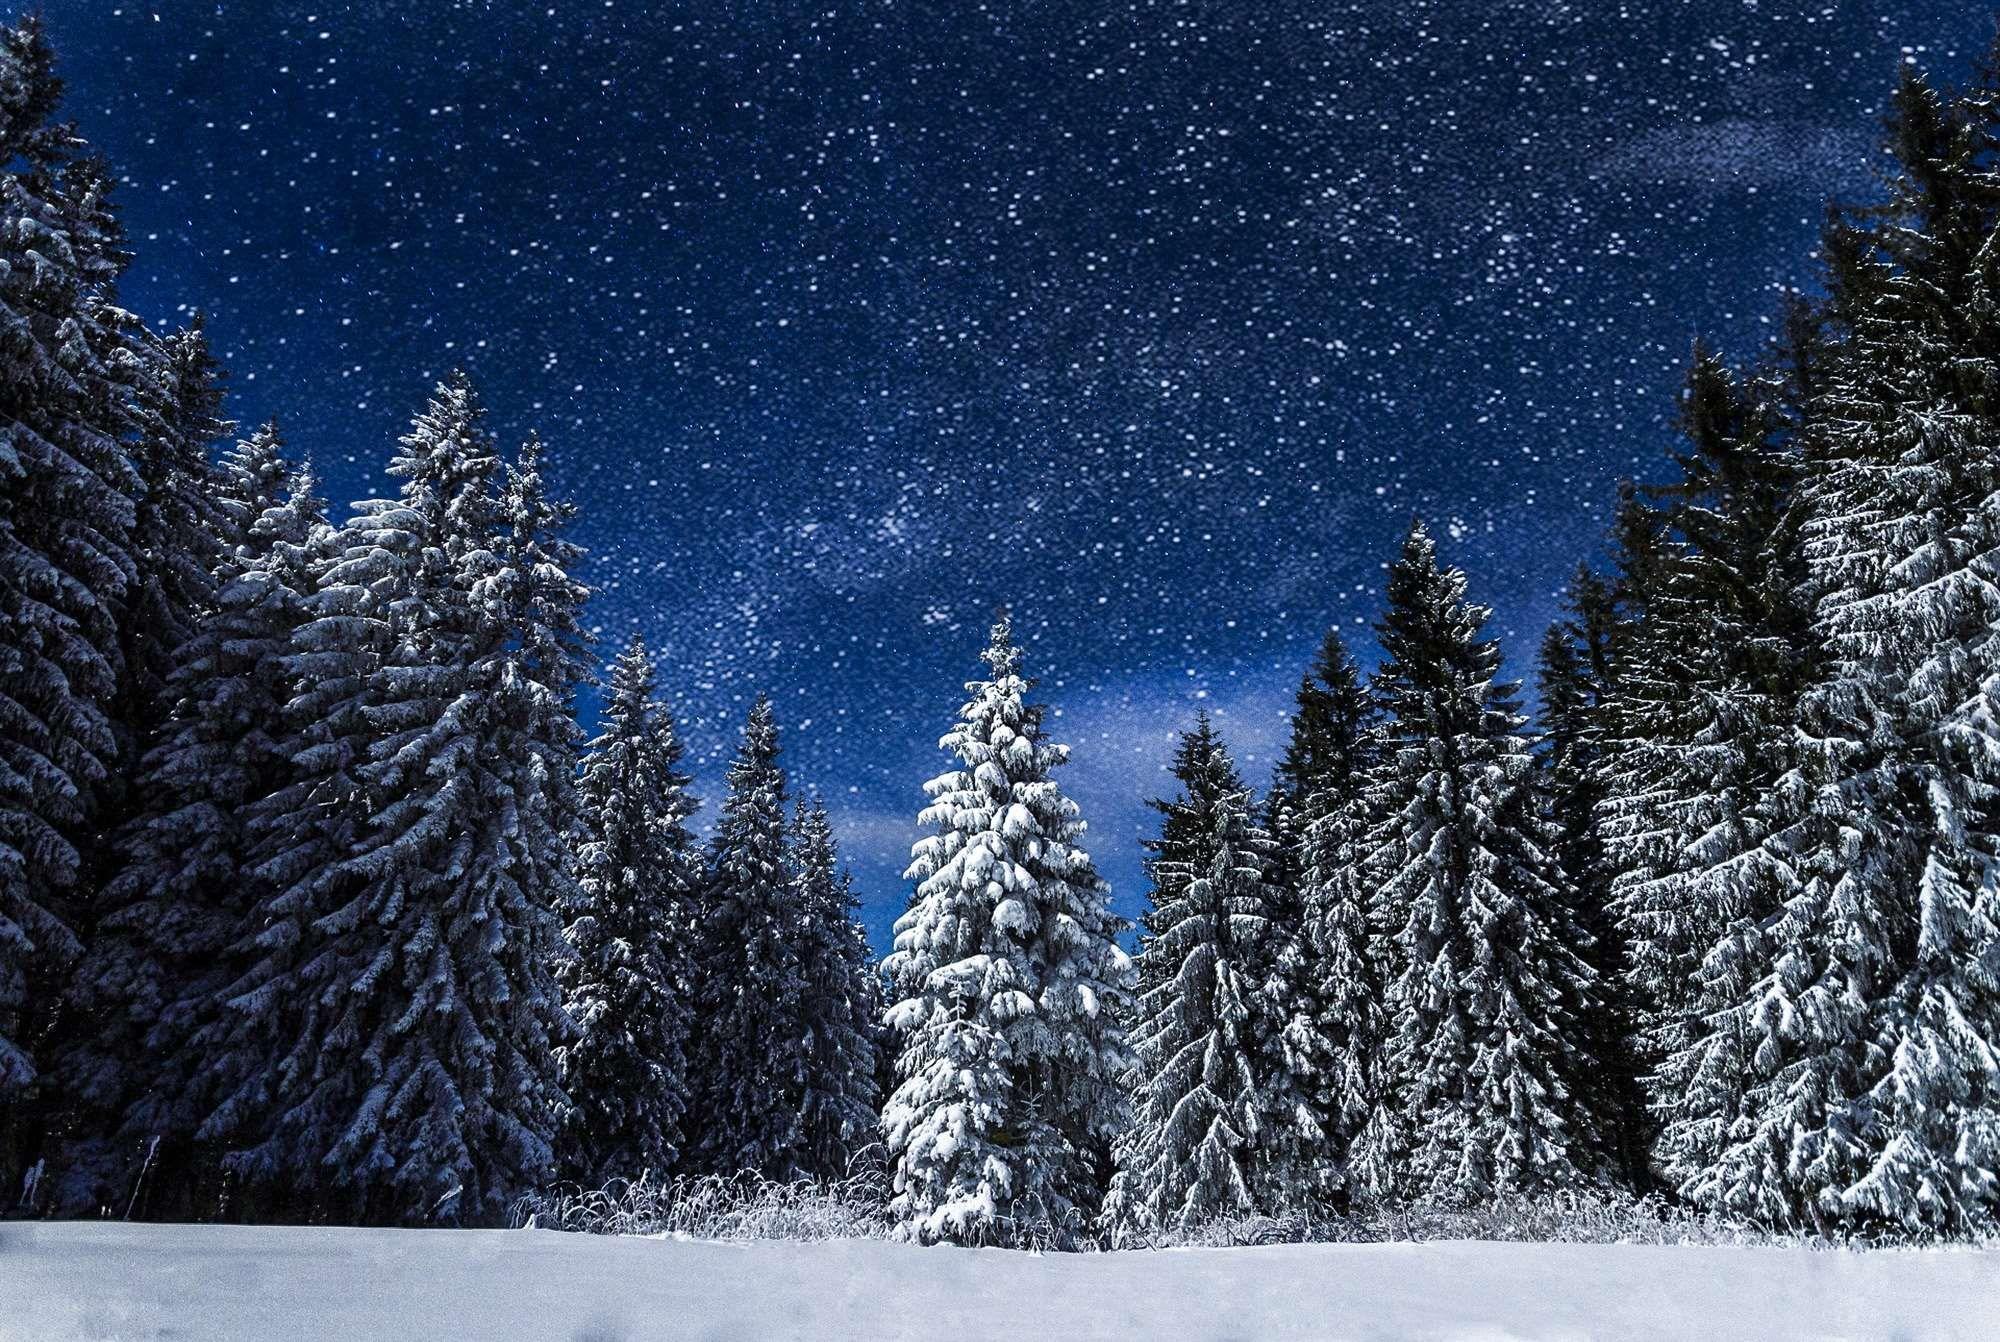 Adventure Blue Cold Cute Magical Night Nature Night Snow Snowy Landscape Tourism Travel Snow Travel Wallpaper Mountain Landscape